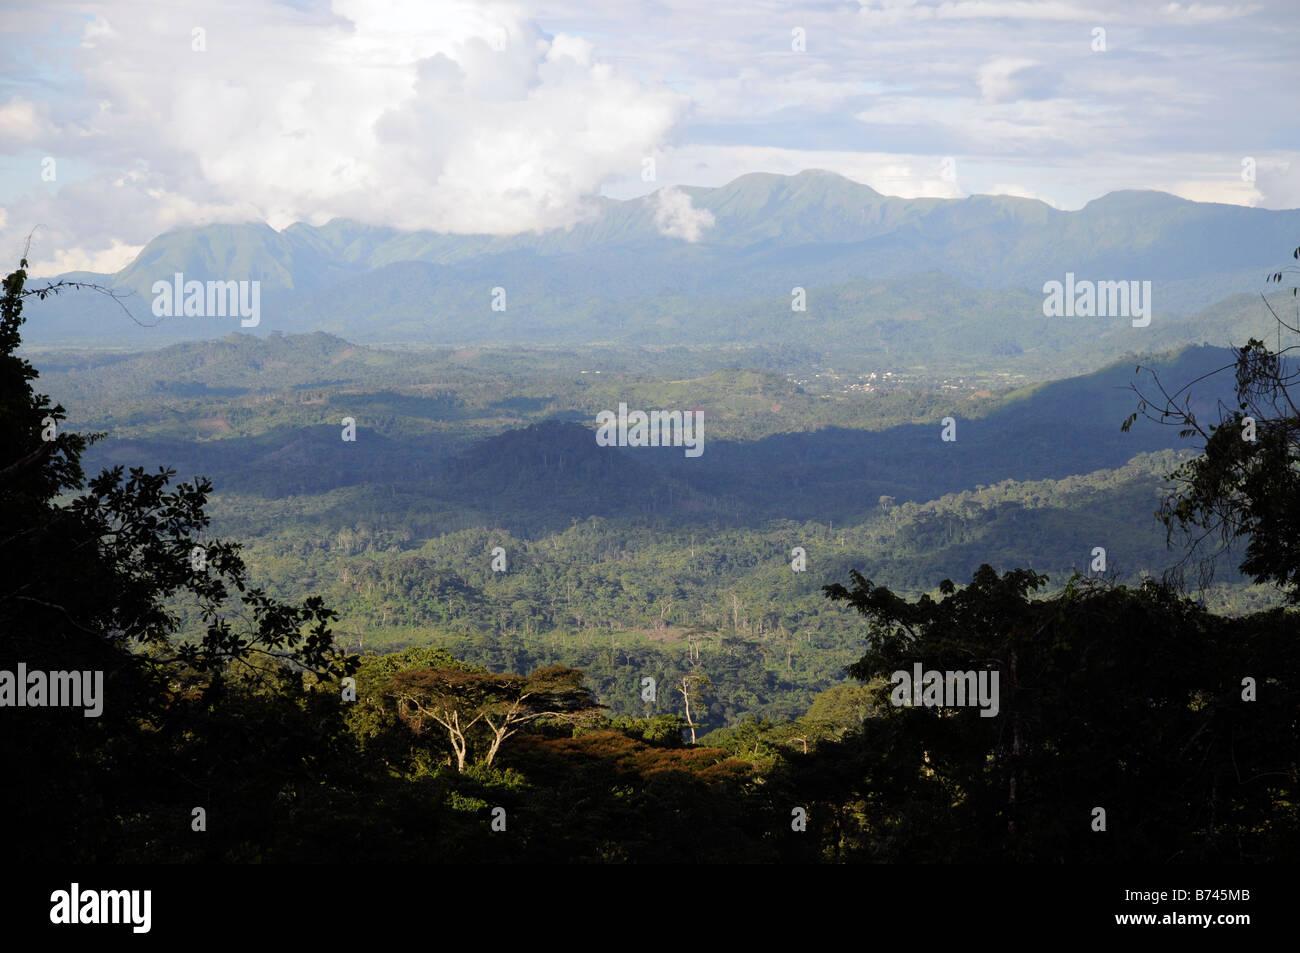 Nimba Mountain range World Heritage Site from the west Liberia - Stock Image